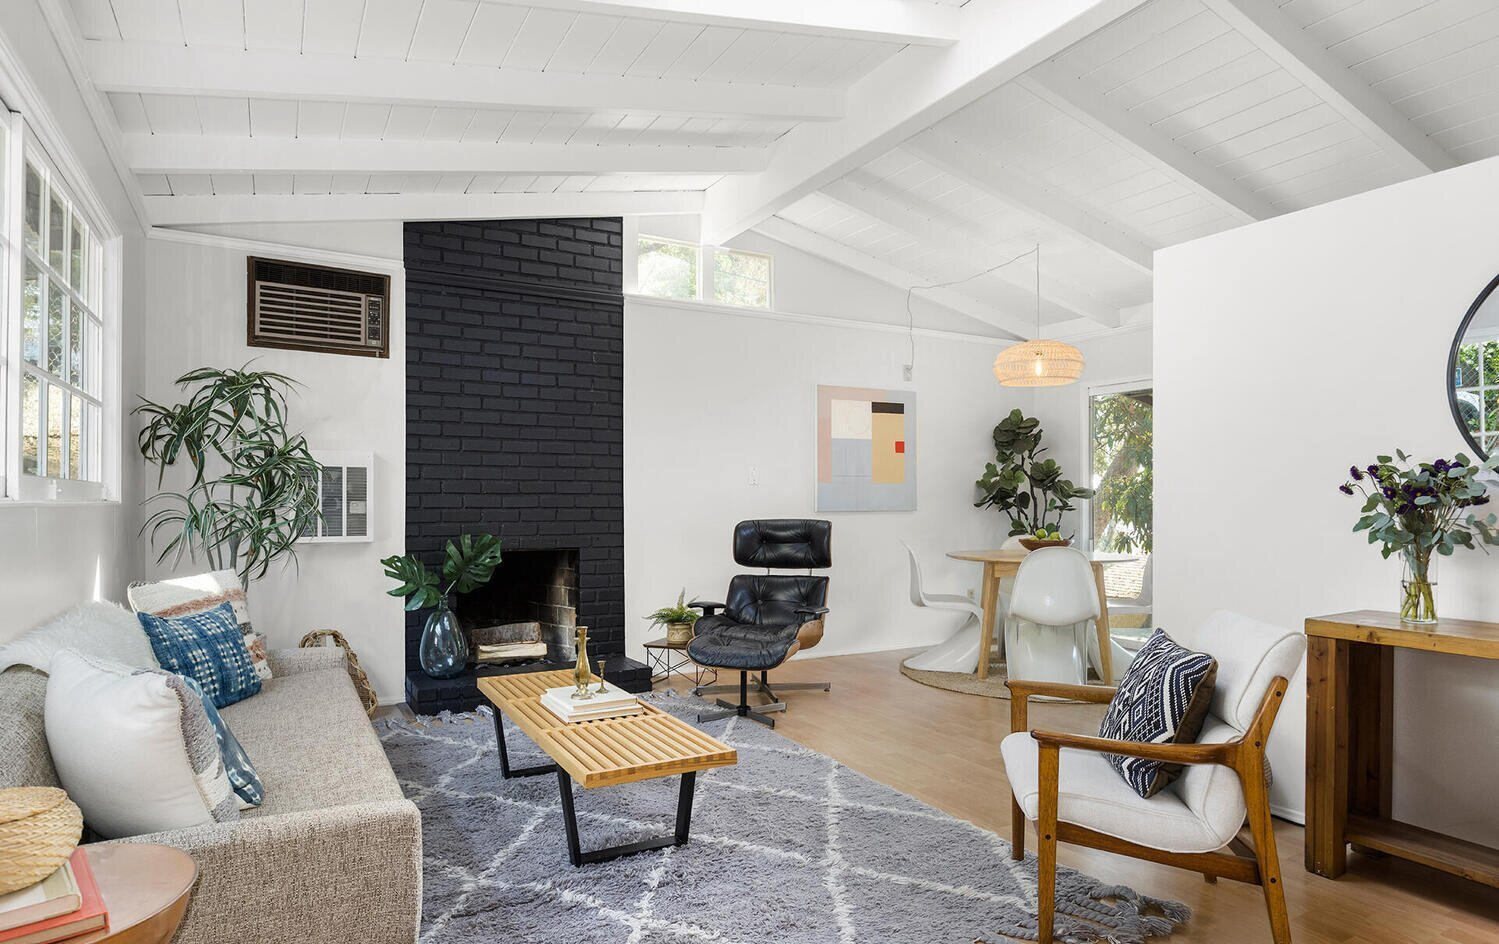 A Charming Los Angeles Bungalow Asks $750K